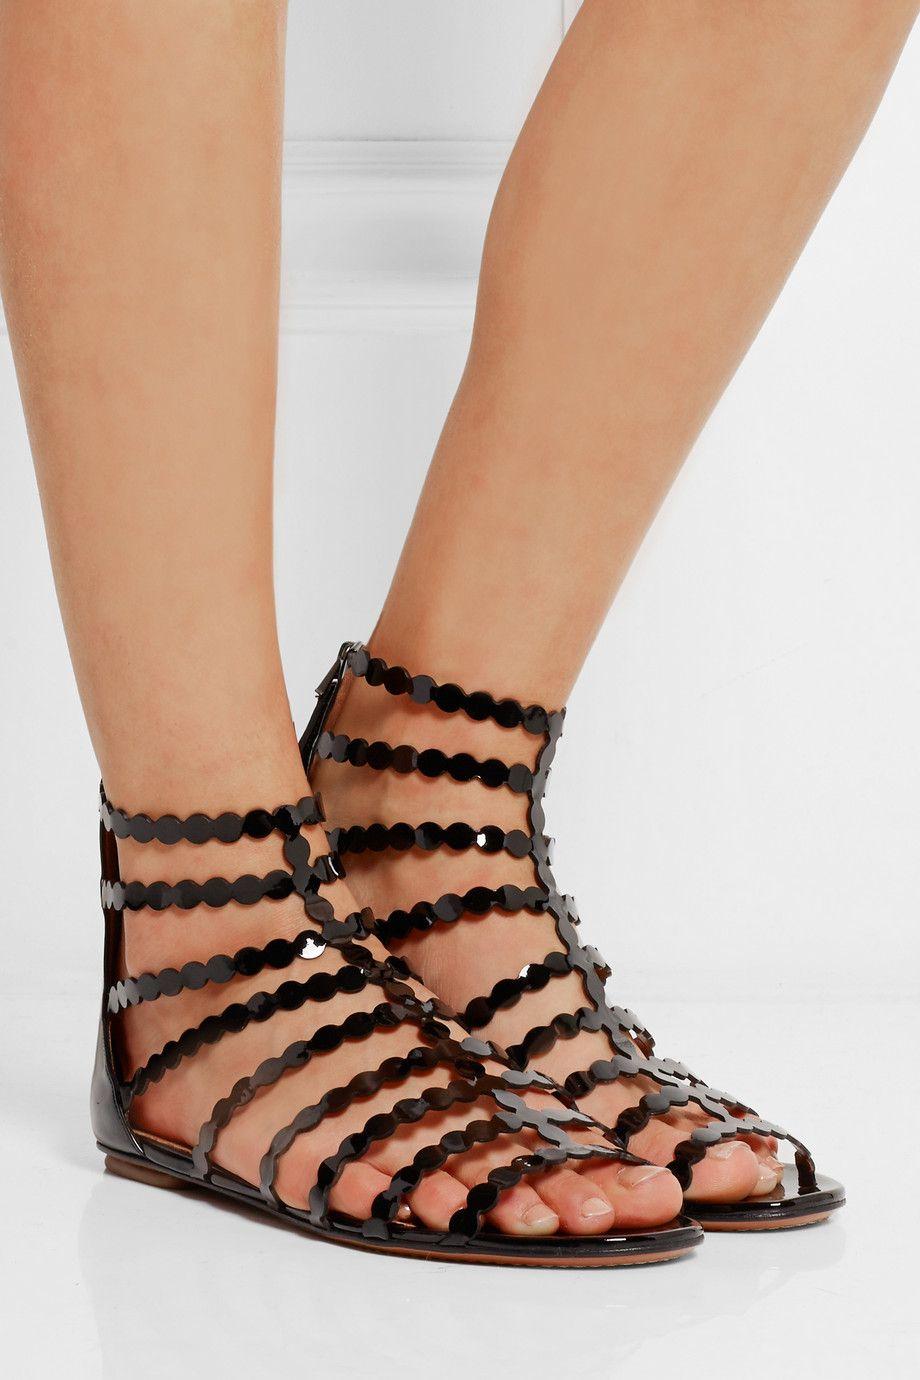 Alaïa Snakeskin-Trimmed Laser Cut Sandals cheap limited edition sale affordable nicekicks cheap price 6zjLzrw